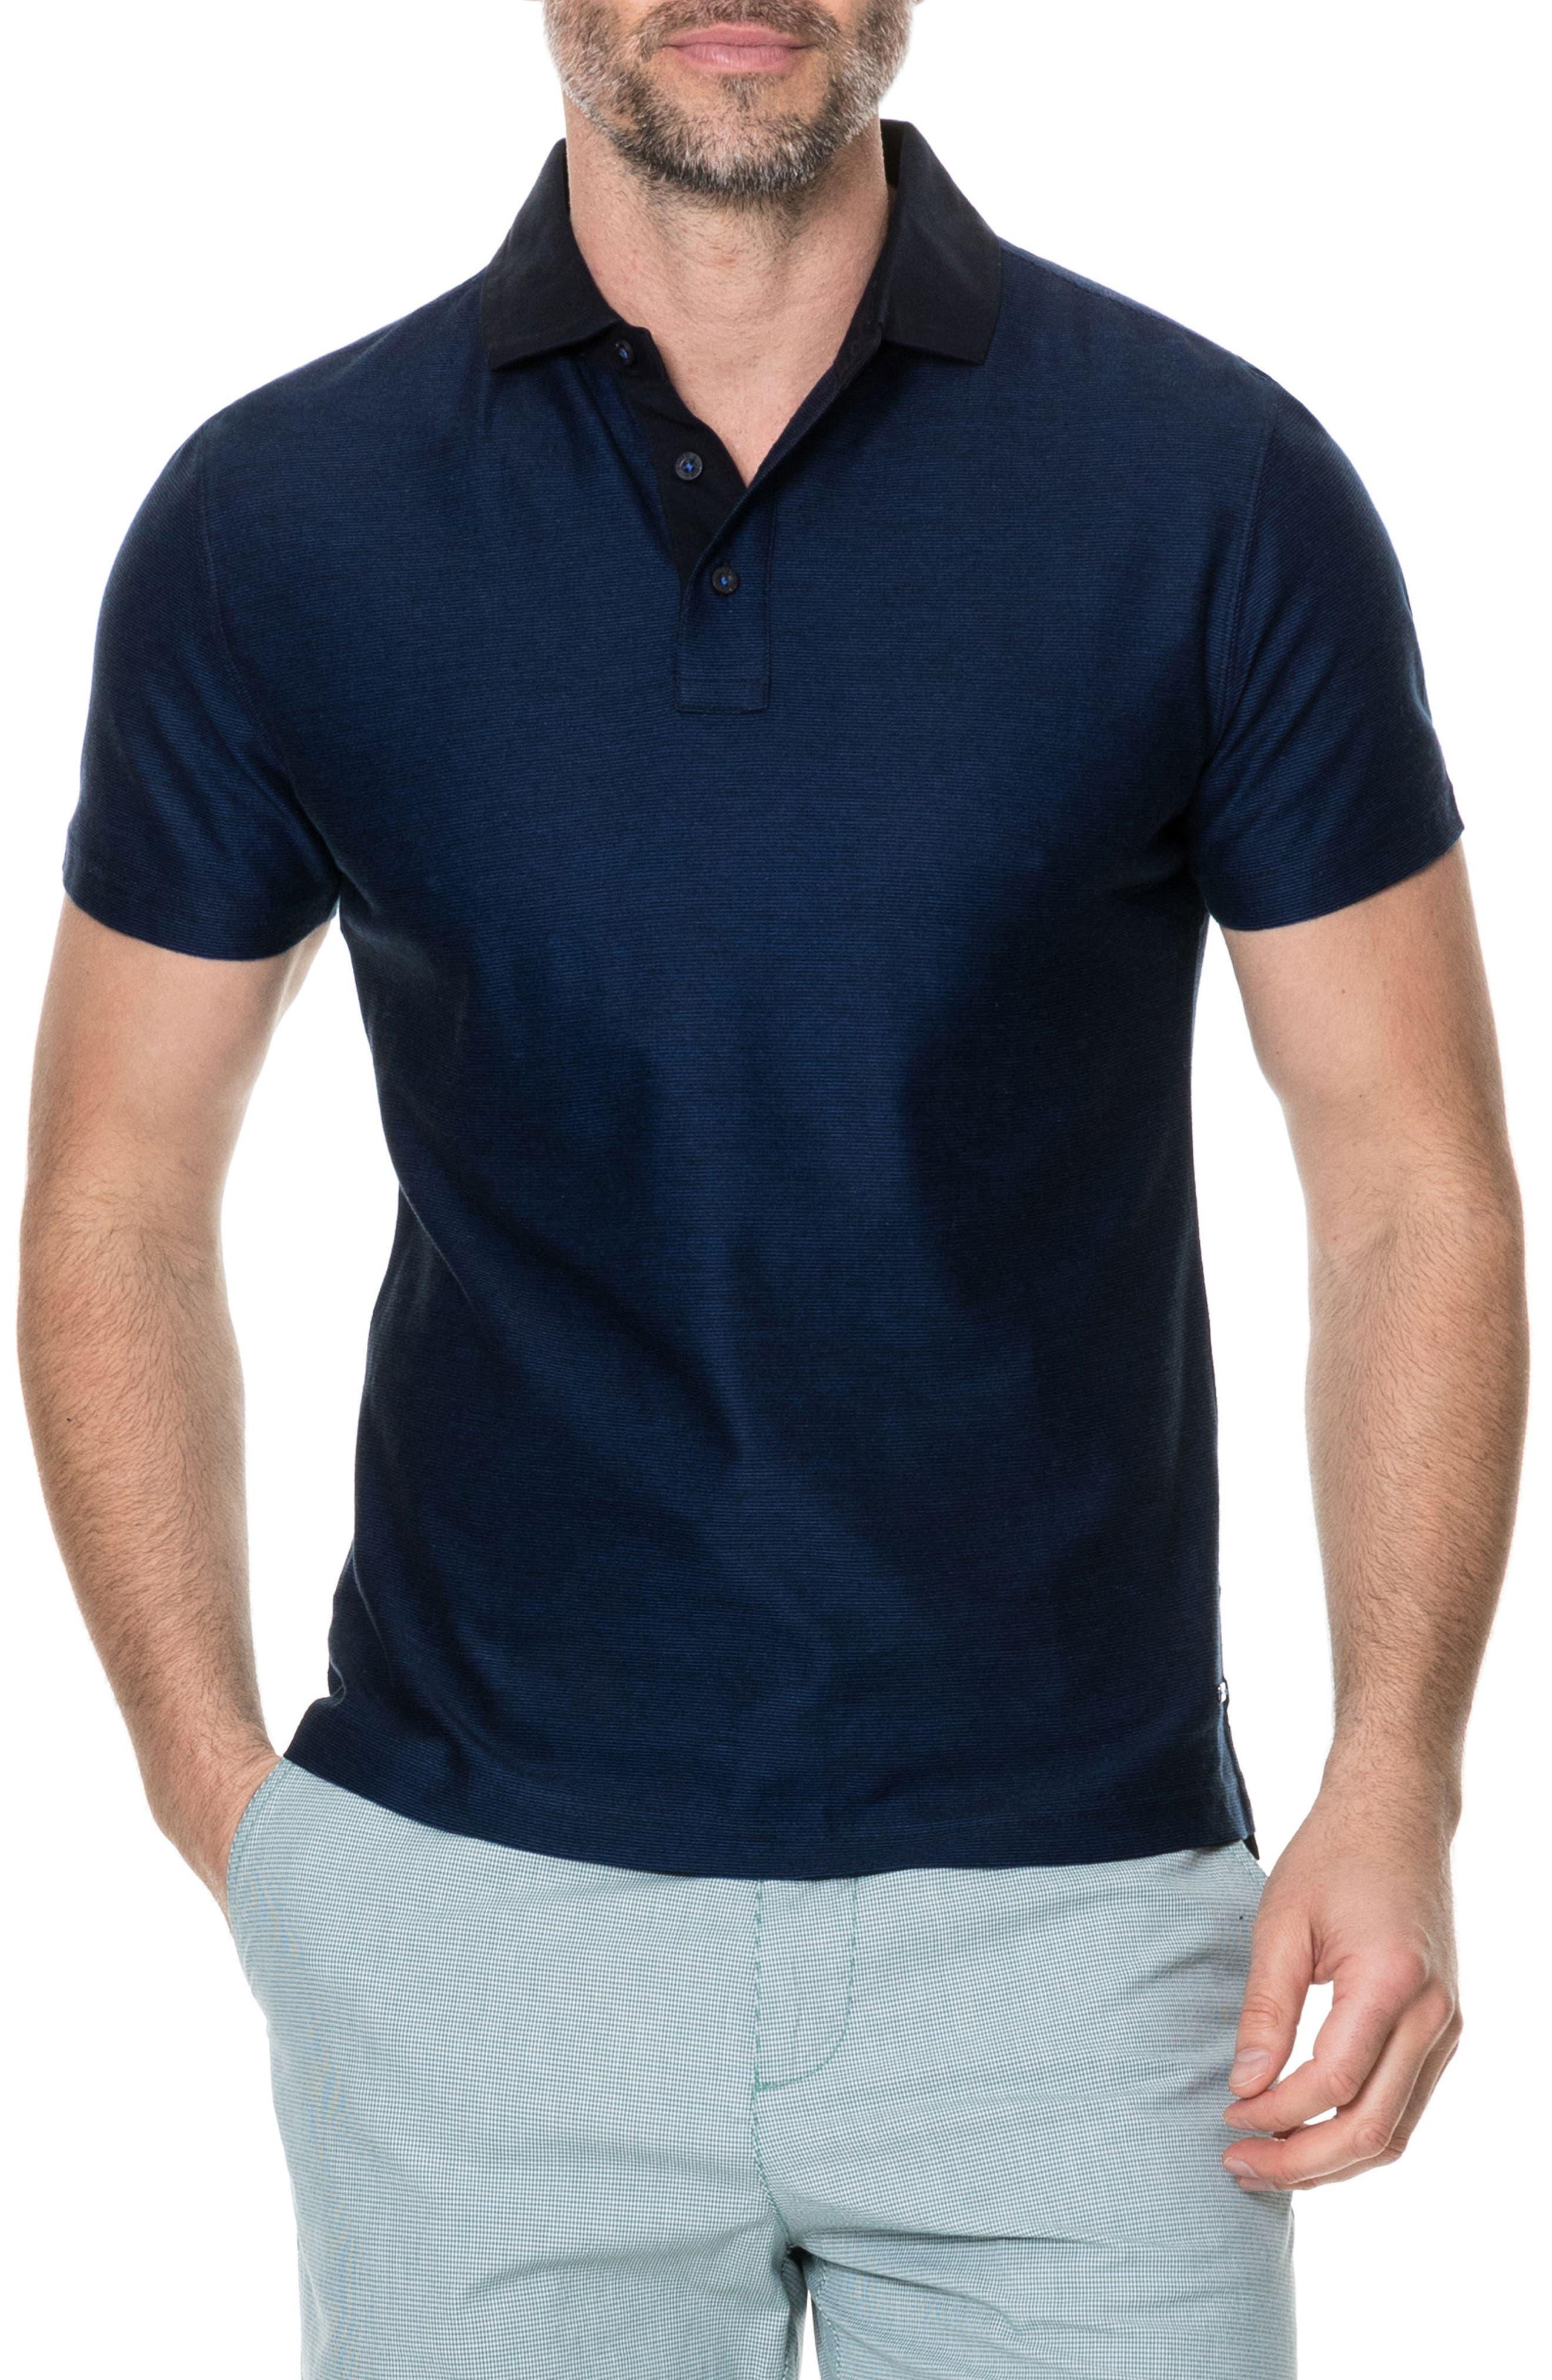 Caplestone Regular Fit Polo,                             Main thumbnail 1, color,                             401